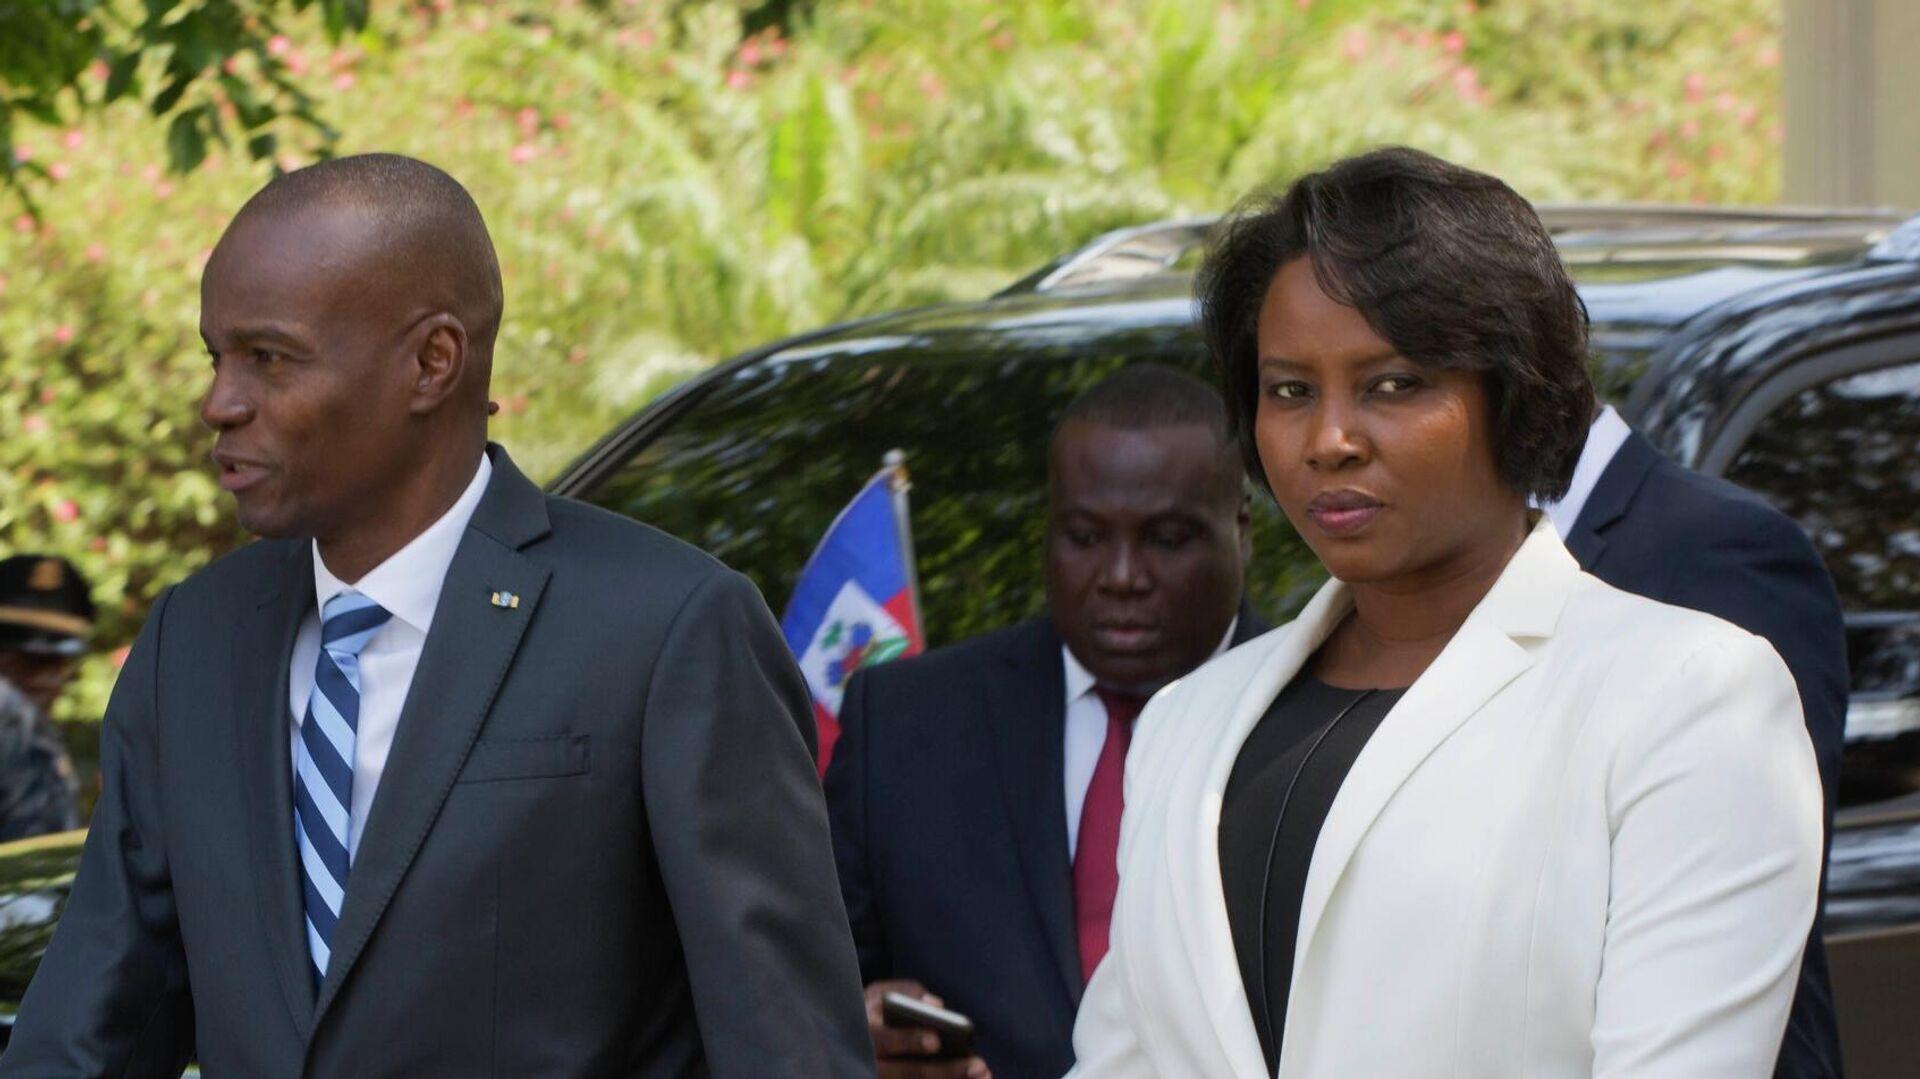 Jovenel Moise, expresidente de Haití y su esposa Martine (archivo) - Sputnik Mundo, 1920, 10.07.2021